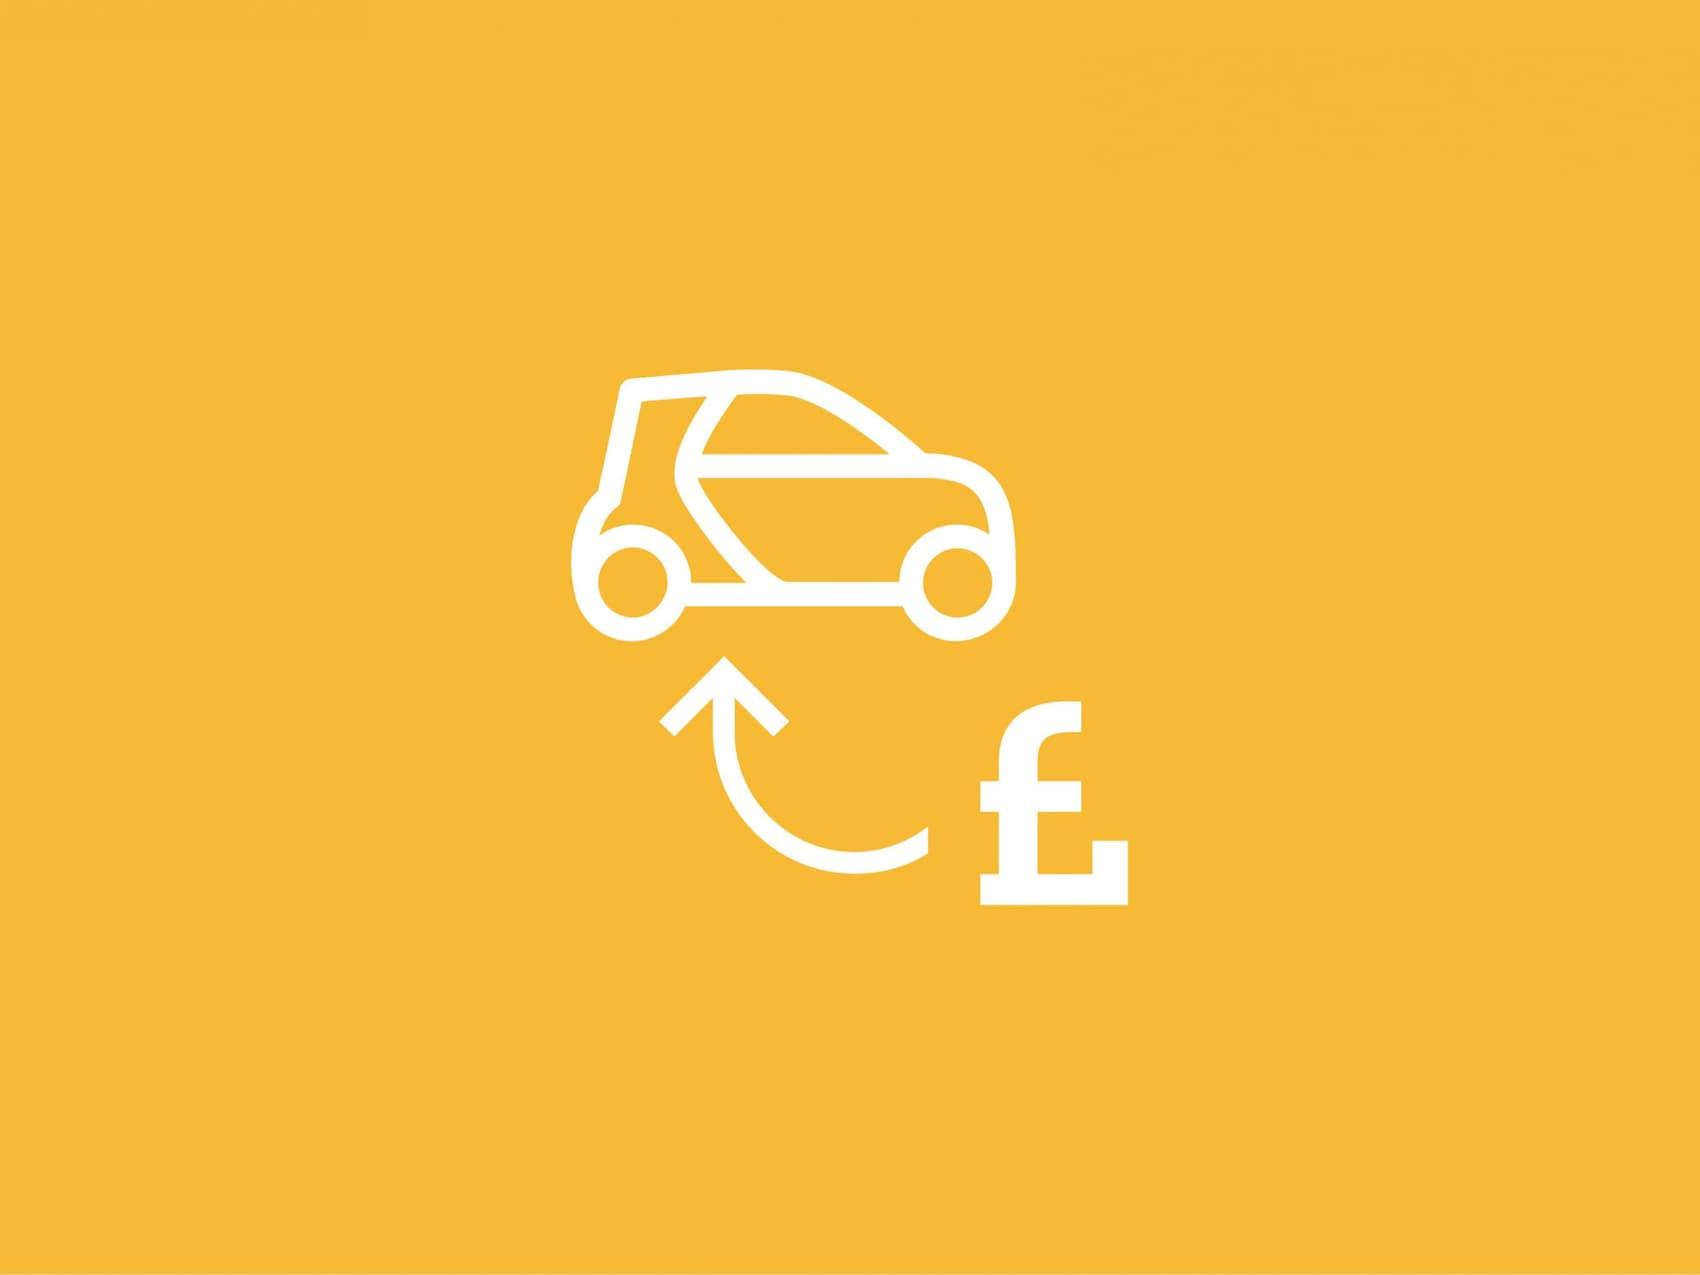 smart Agility - Purchase your vehicle